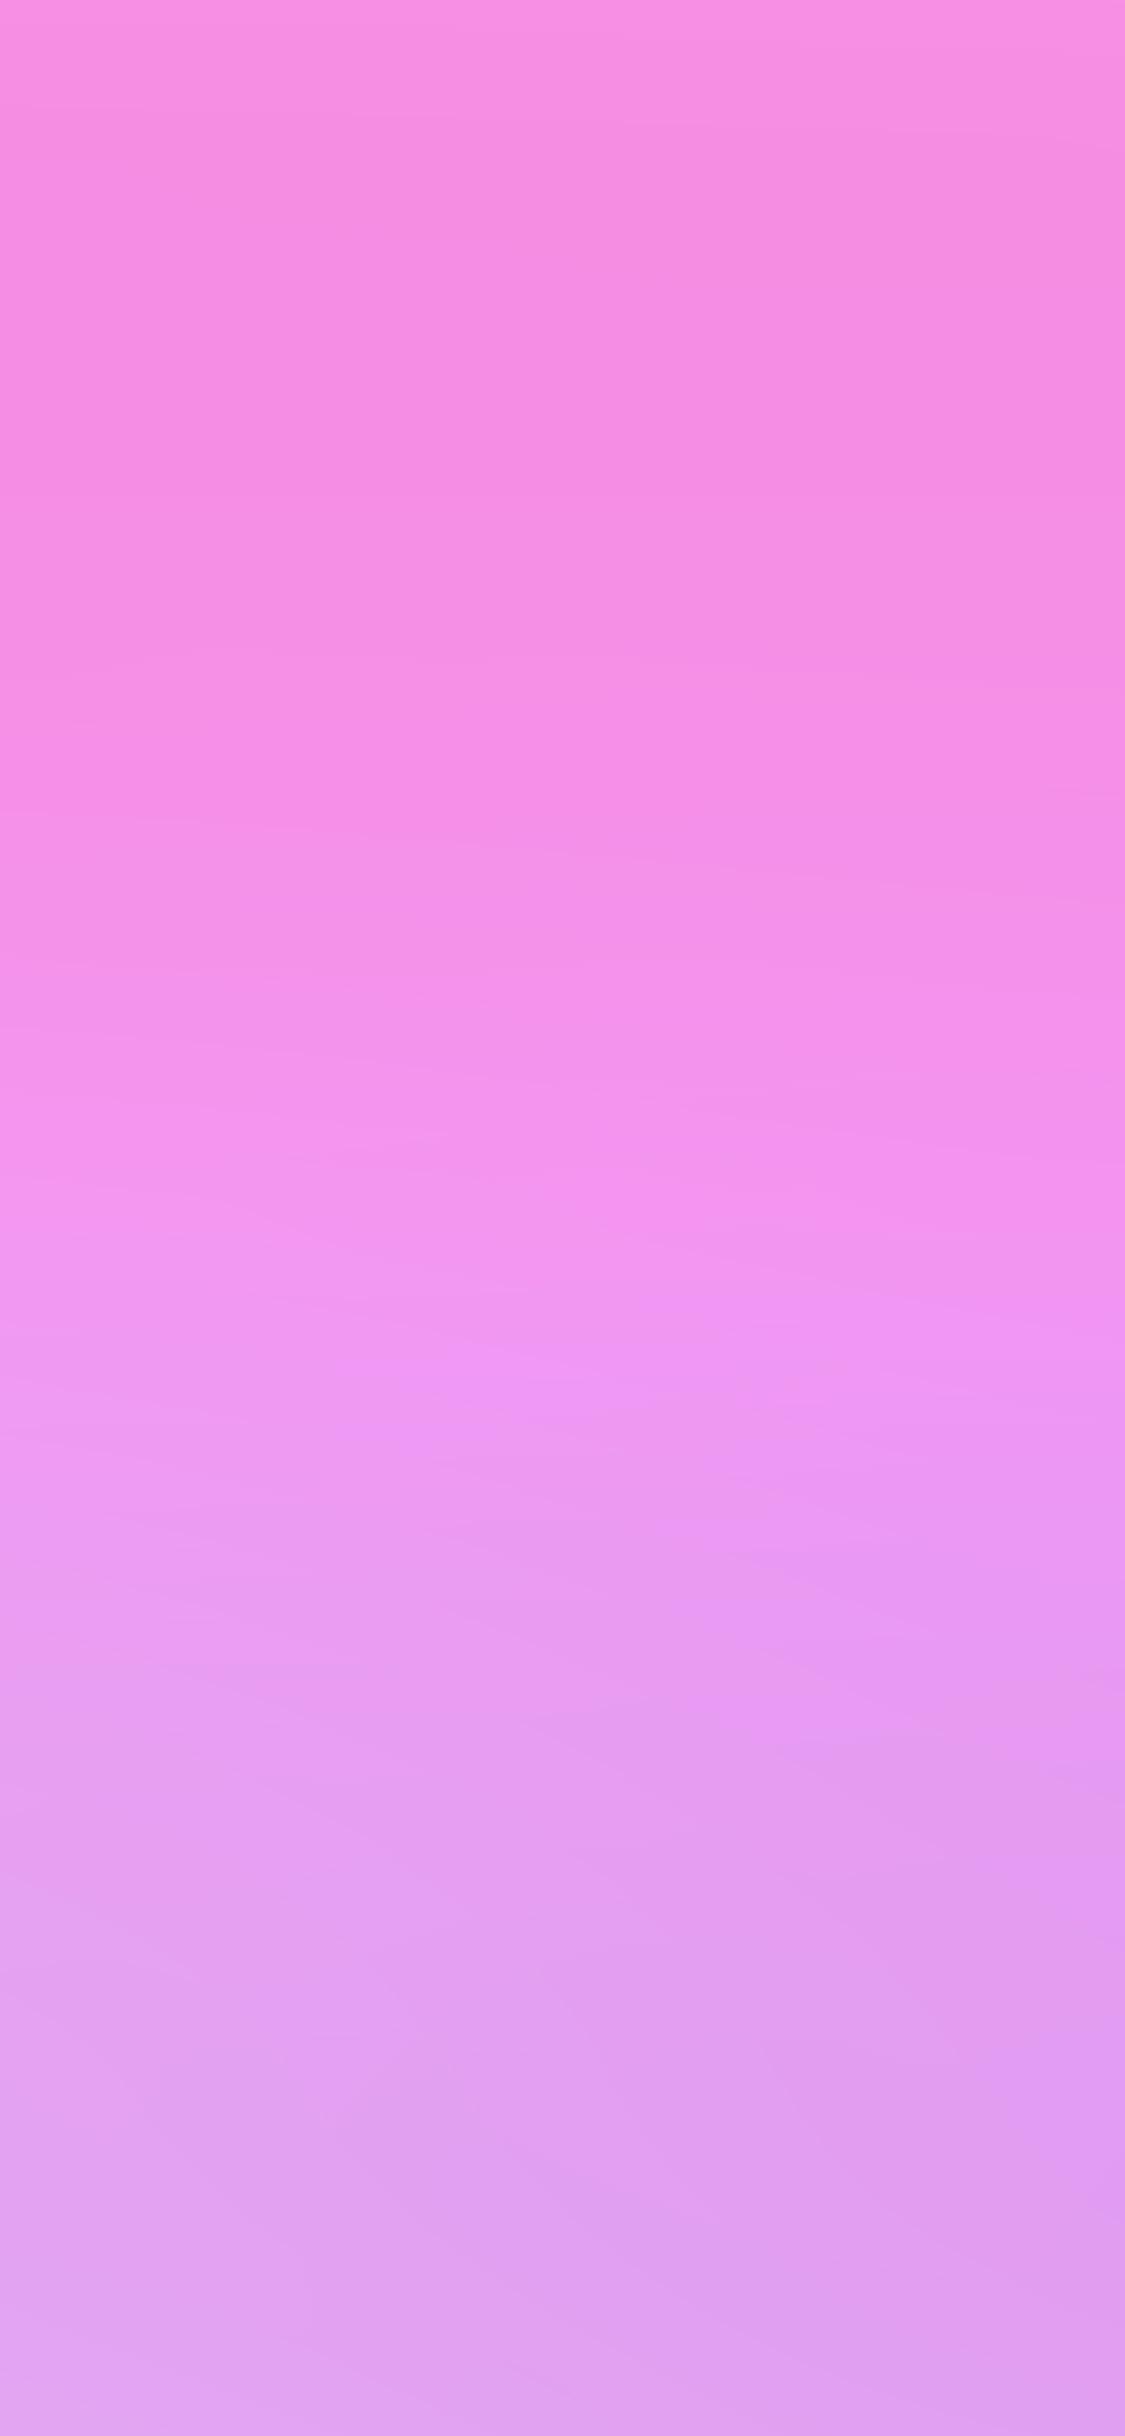 iPhonexpapers.com-Apple-iPhone-wallpaper-sn02-purple-burning-blur-gradation